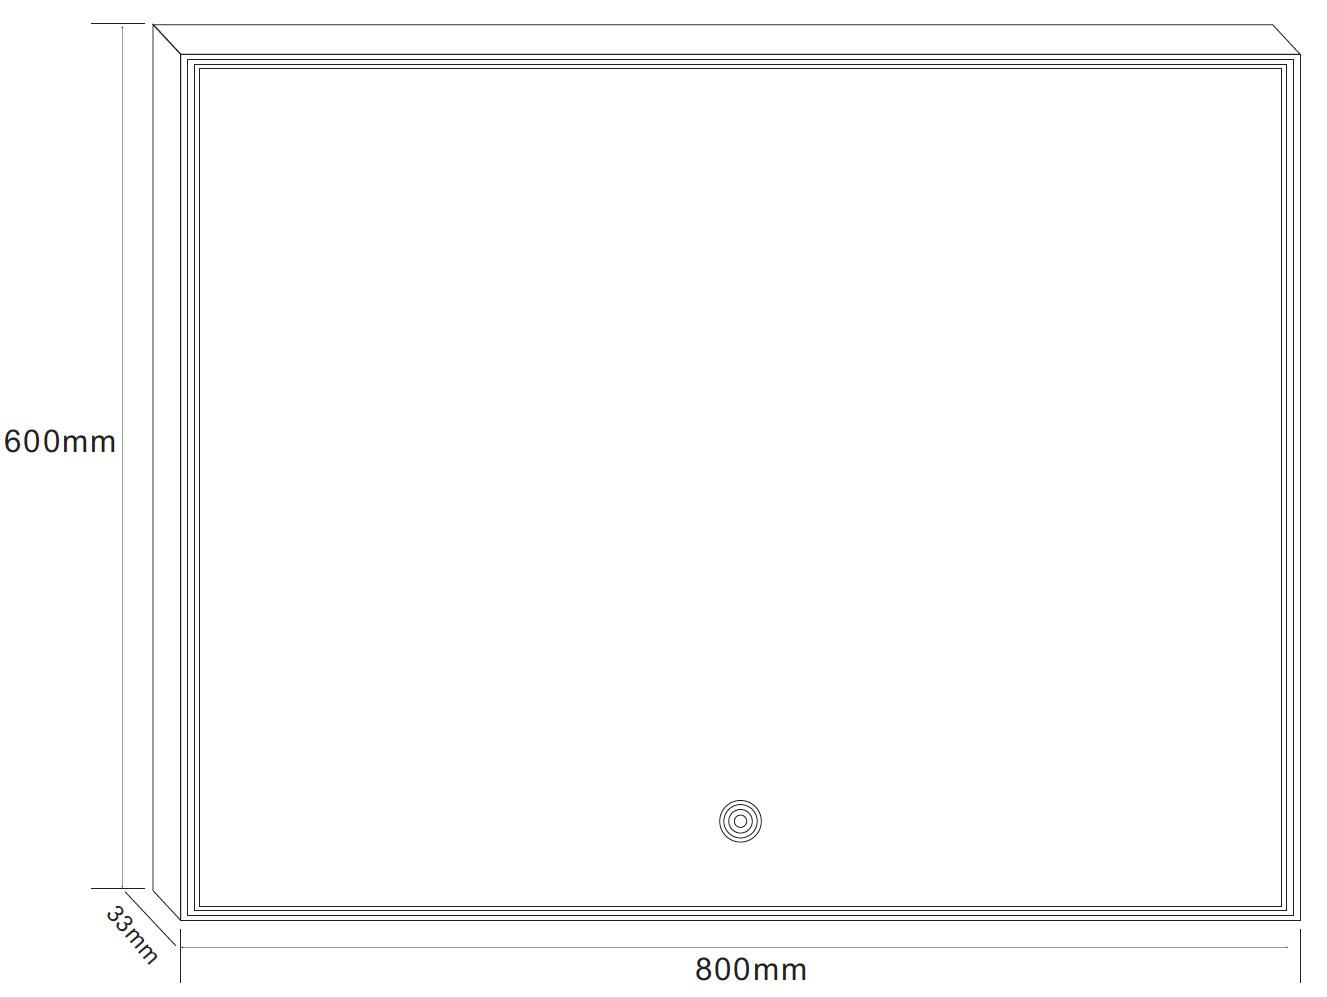 miroir lumineux led salle de bain anti bu e 80x60 cm. Black Bedroom Furniture Sets. Home Design Ideas